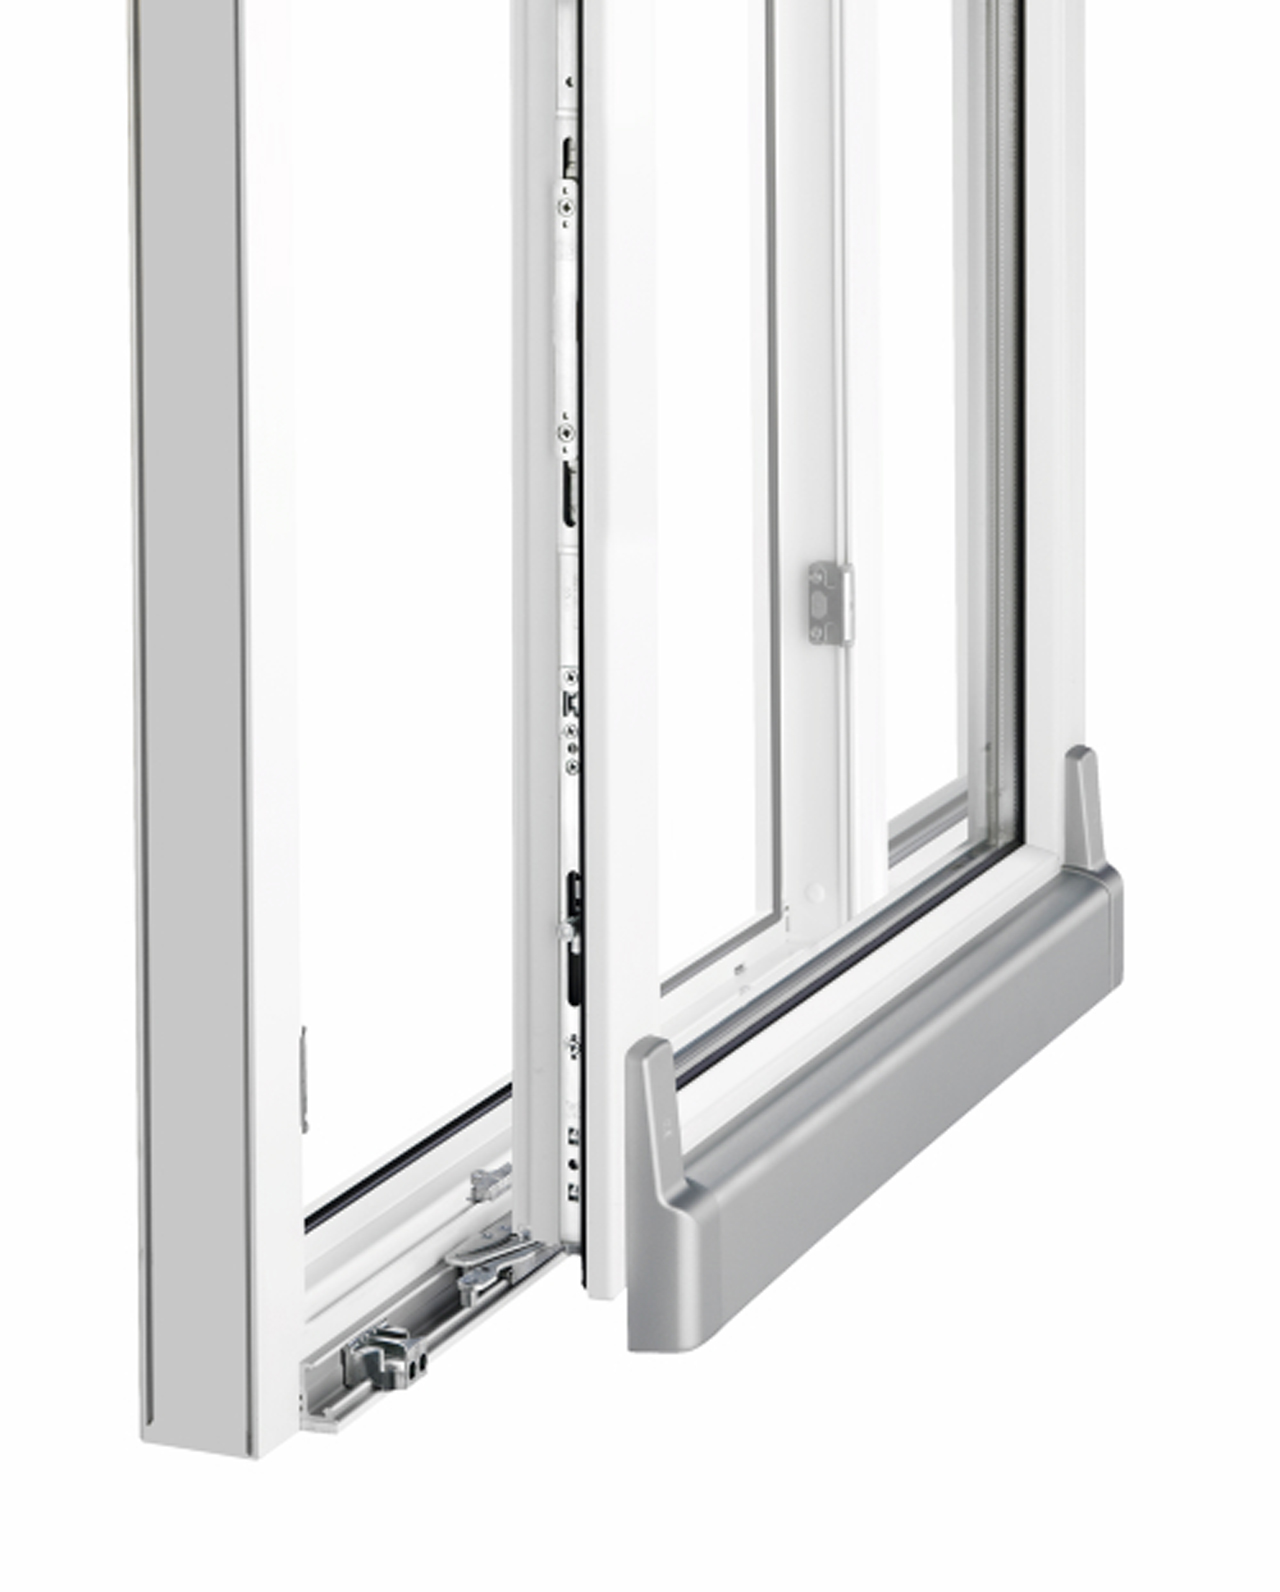 Bekannt MB Fensterfabriken - Parallel-Schiebe-Kipp-Tür (PSK) SF63